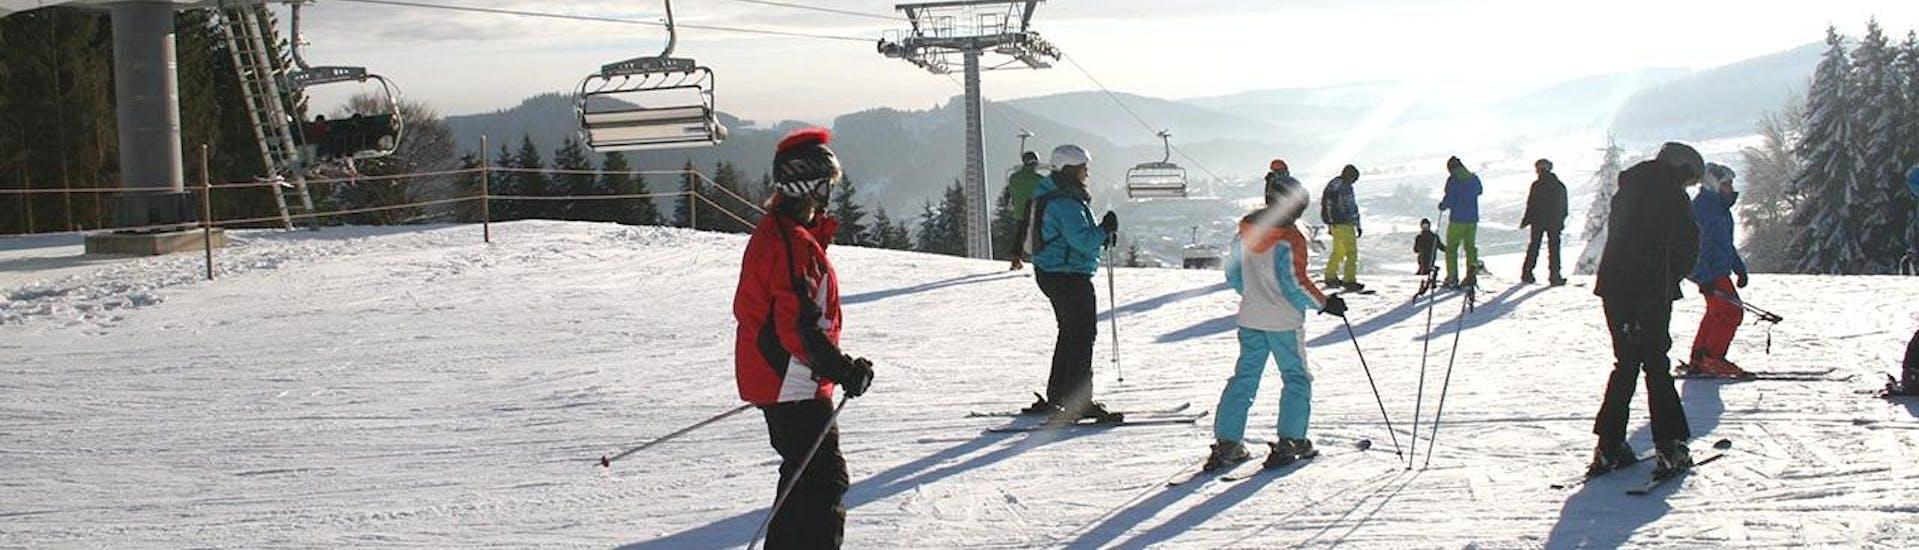 ski-lessons-for-teens-13-17-years-all-levels-full-day-skischule-snow-bike-factory-willingen-hero